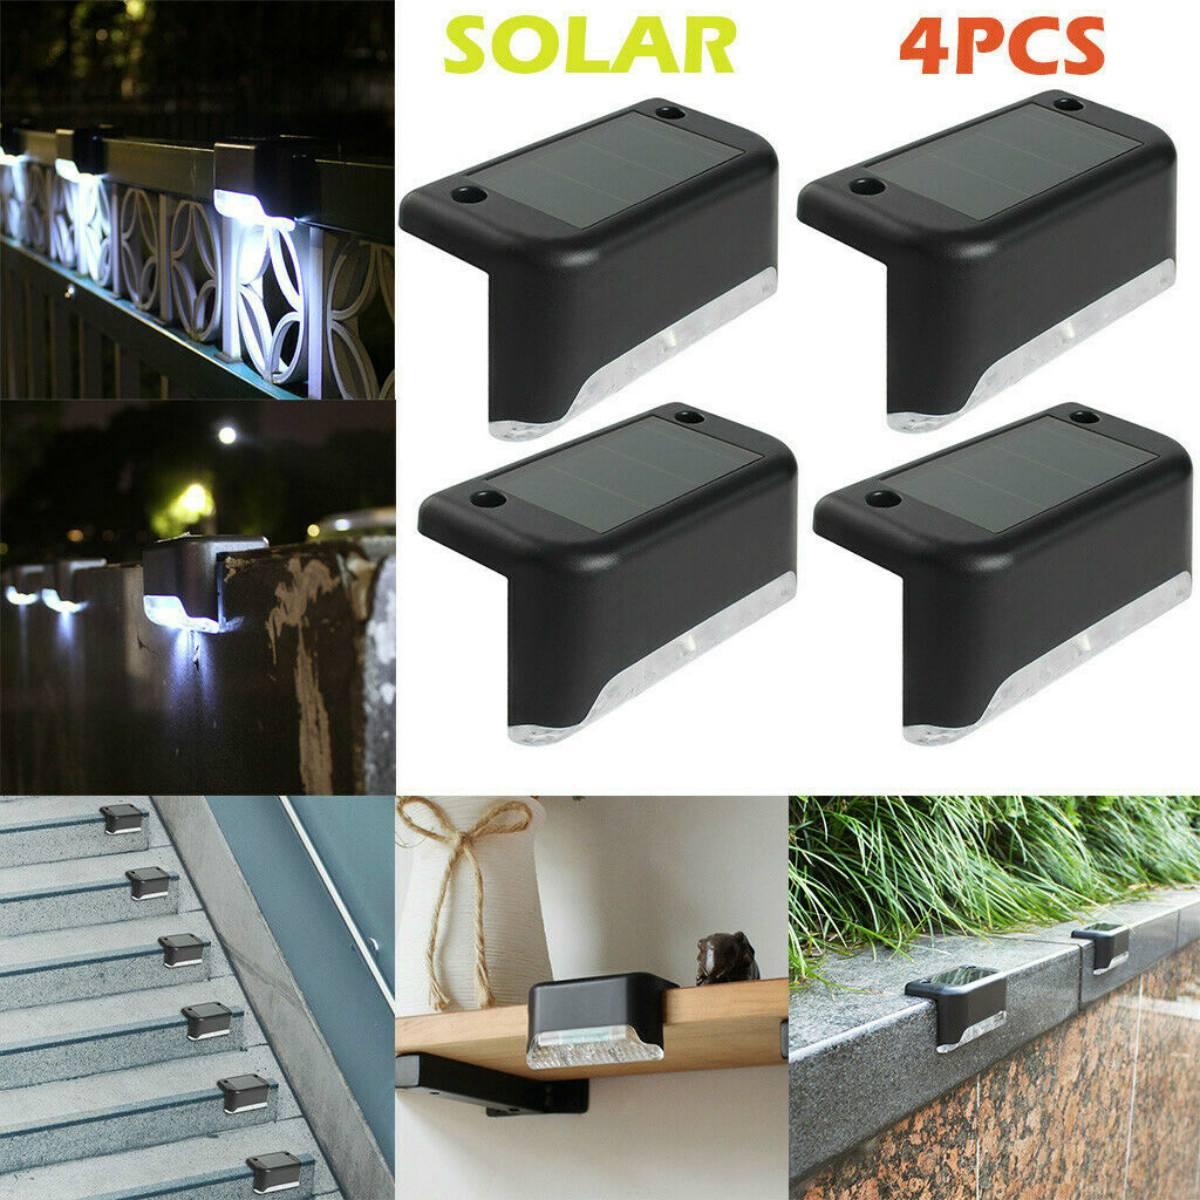 4Pcs/Set Solar Fence Post Lights Outdoor Yard Fence Security Wall Lamp Dark Sensing Waterproof Solar Light 8x4.5x4cm